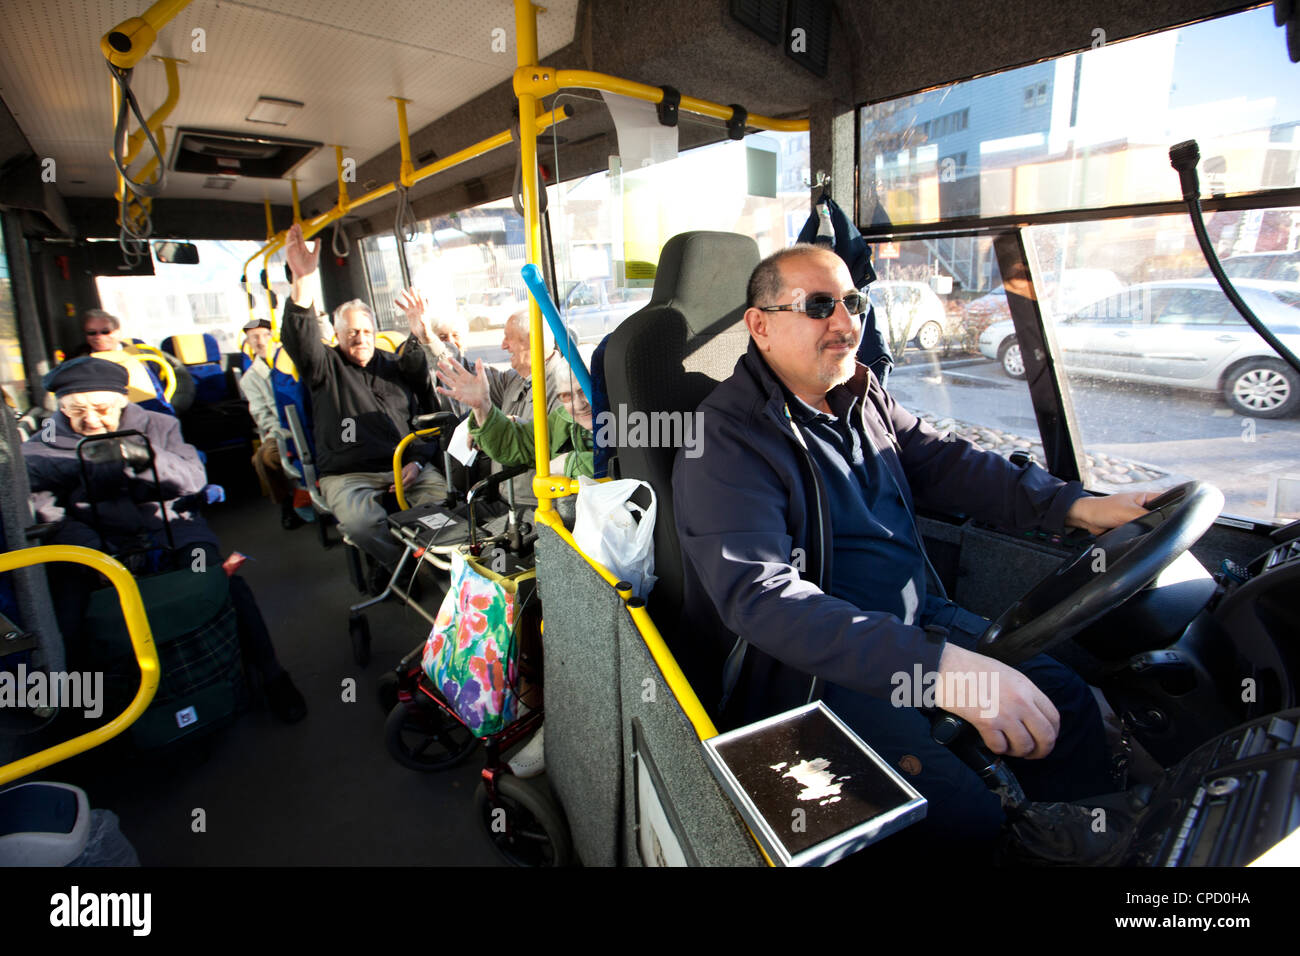 passengers on the bus pdf